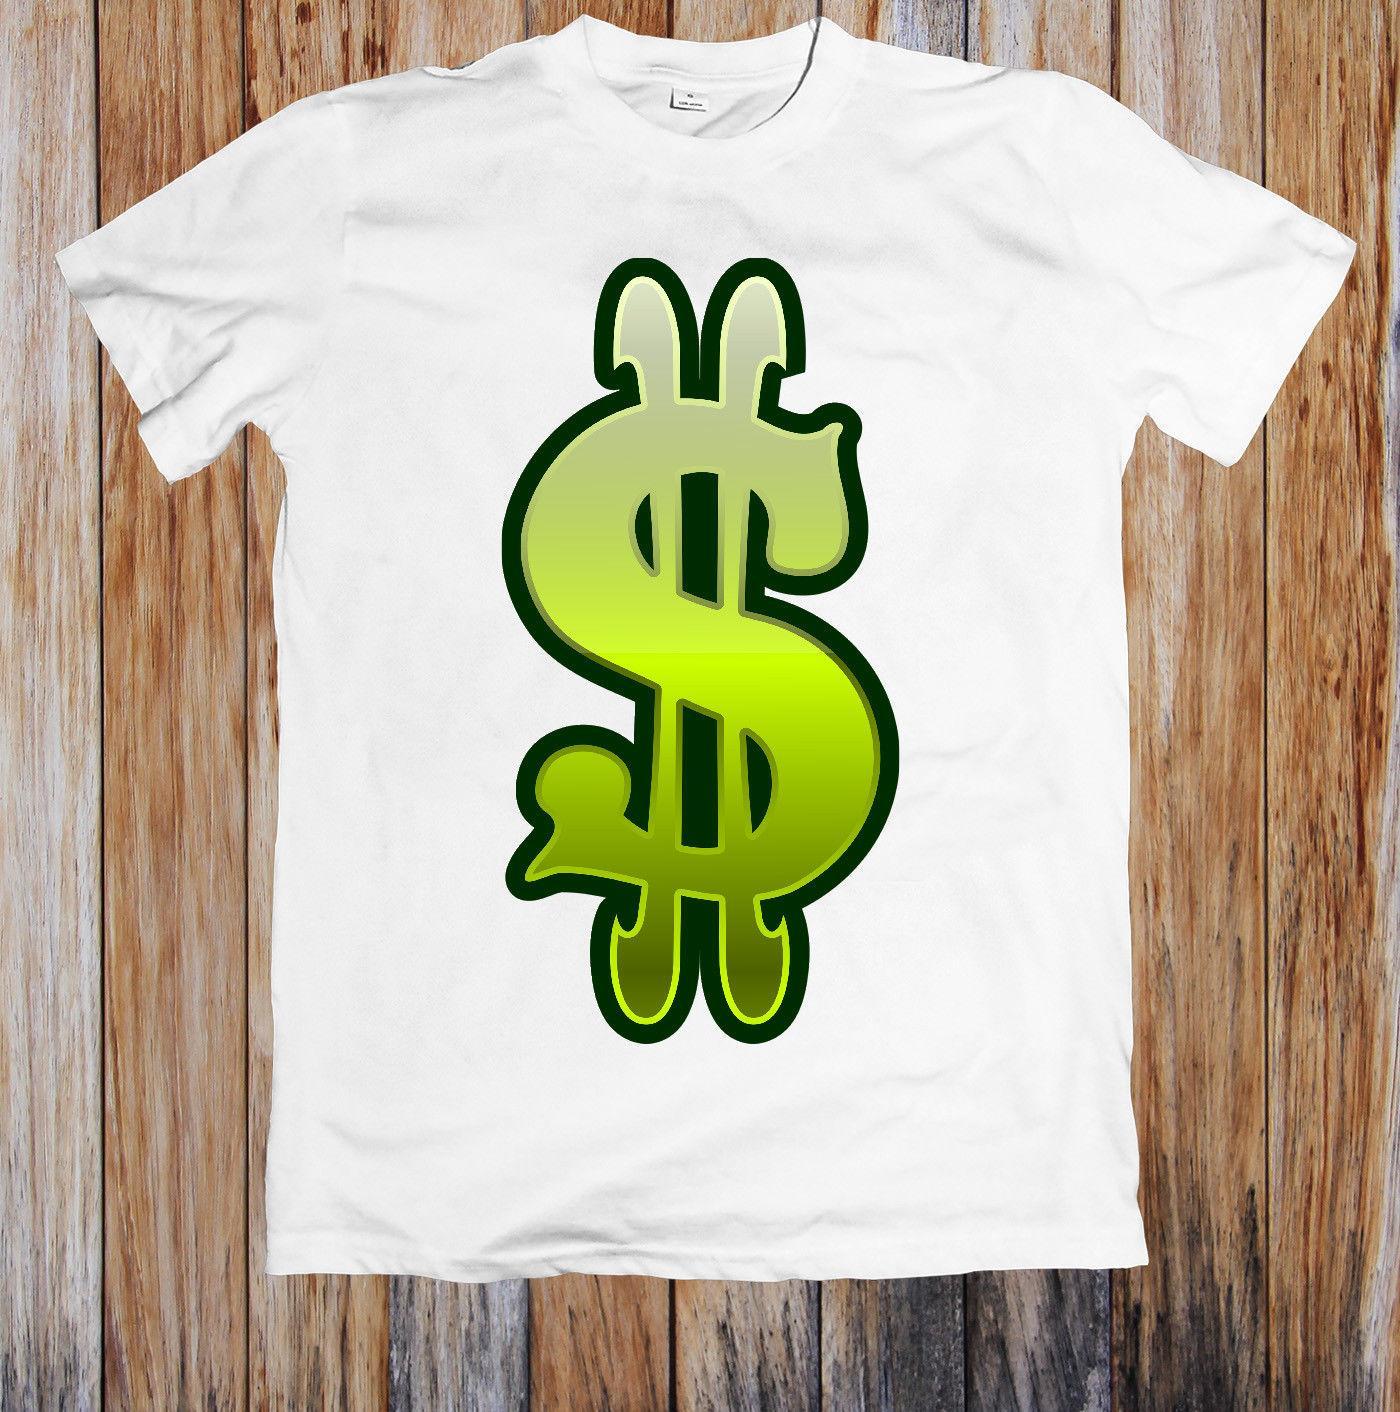 GREEN SLOT MACHINE DOLLAR SIGN UNISEX T-SHIRT size discout hot new tshirt